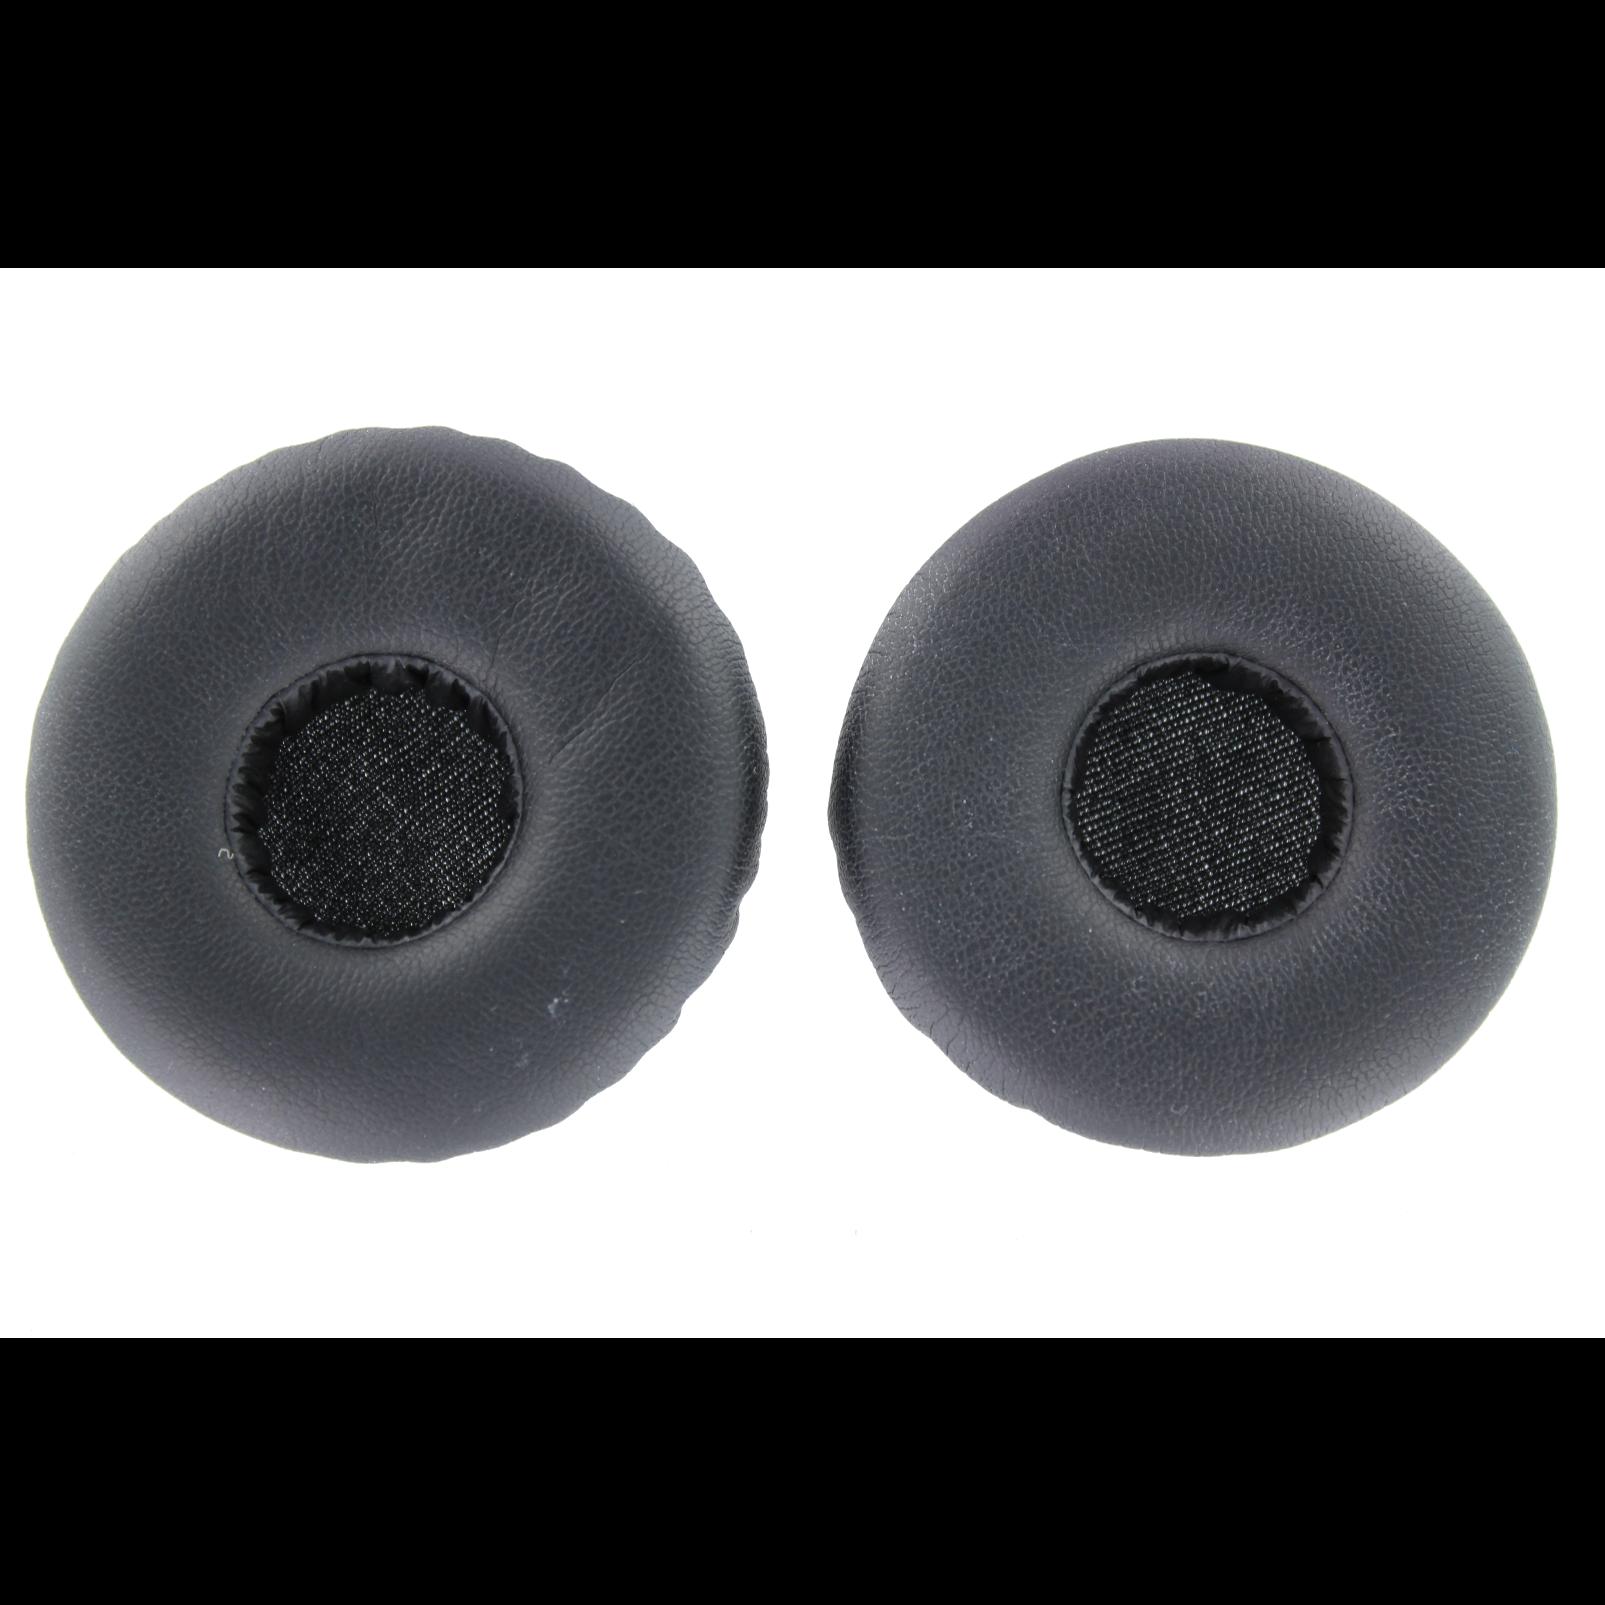 AKG Ear pads for N60NC - Black - Ear pads (L+R) - Hero